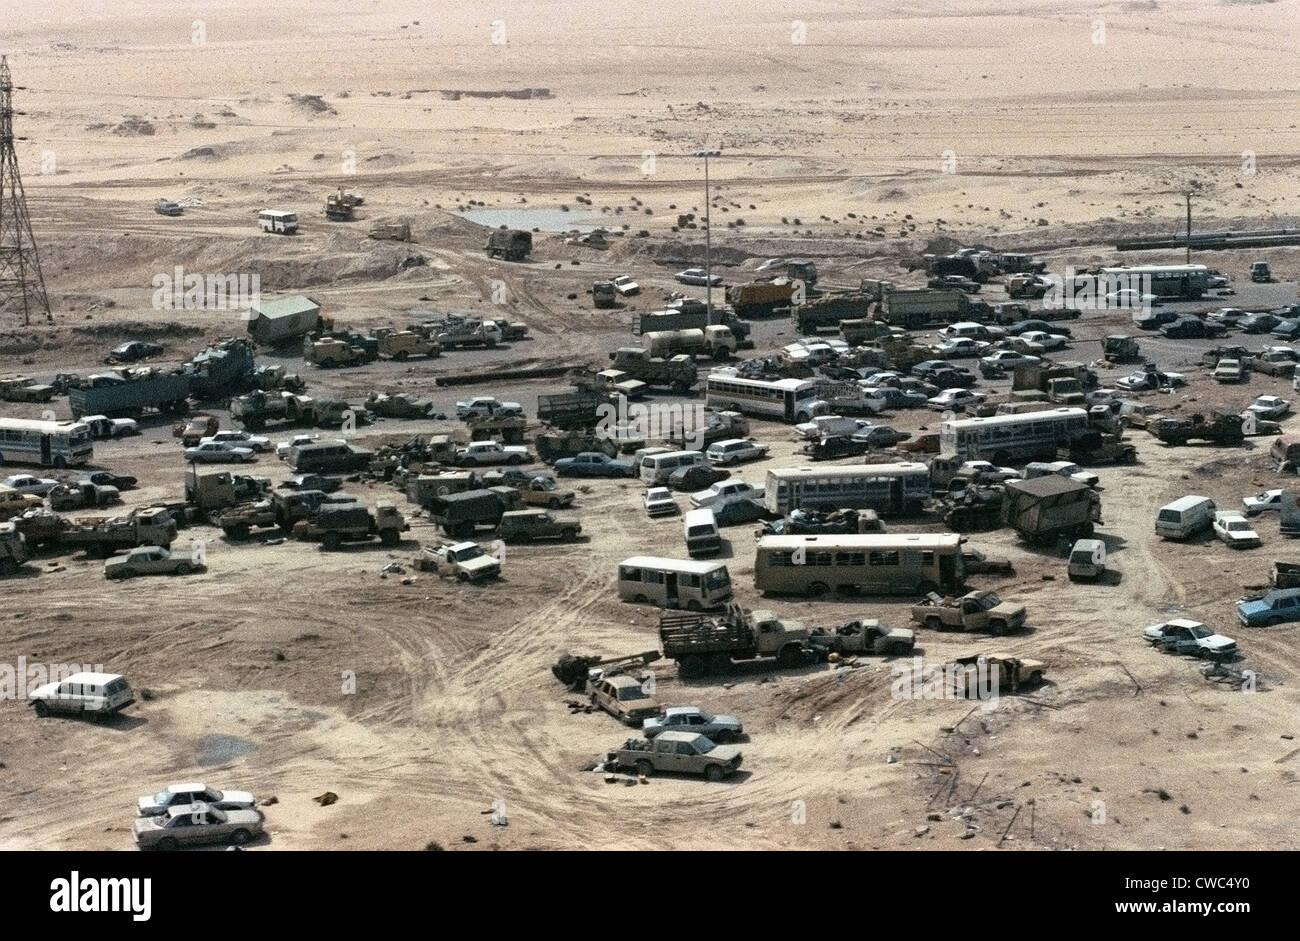 Iraqi Vehicles damaged and abandoned along Highway 80 west of Kuwait City during Operation Desert Storm. Mar. 1 - Stock Image